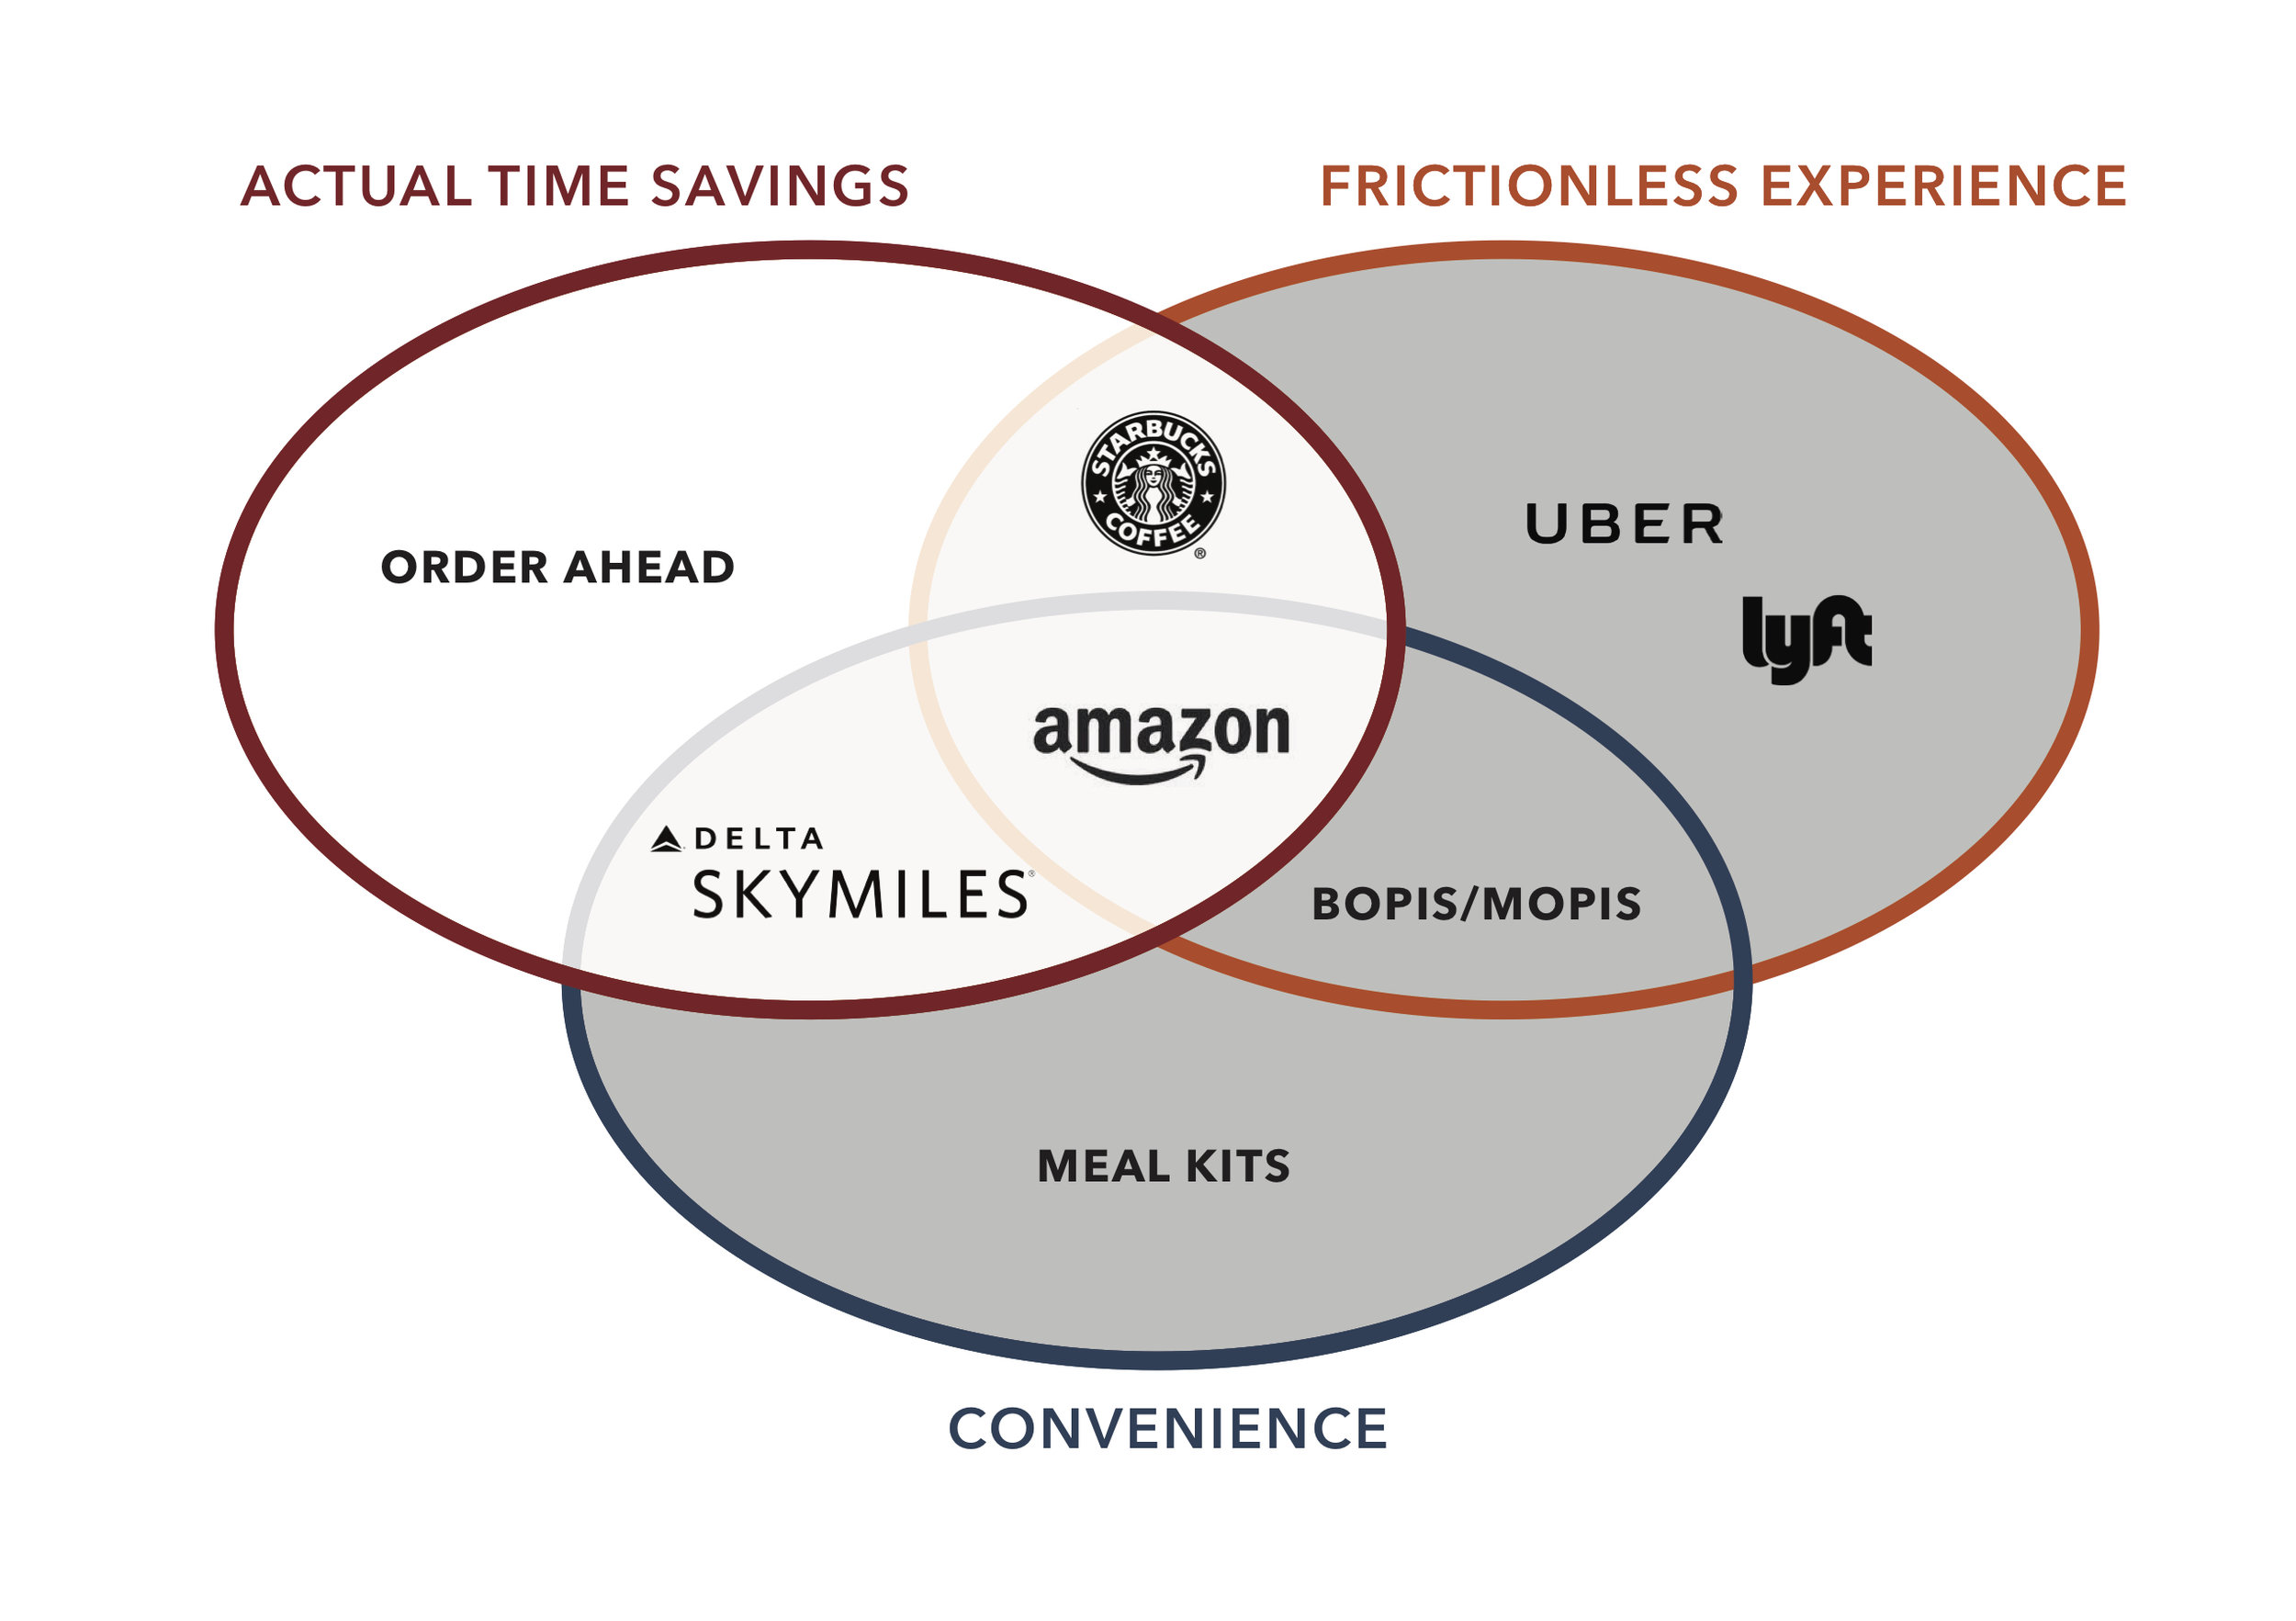 Actual Time Savings Image.jpg